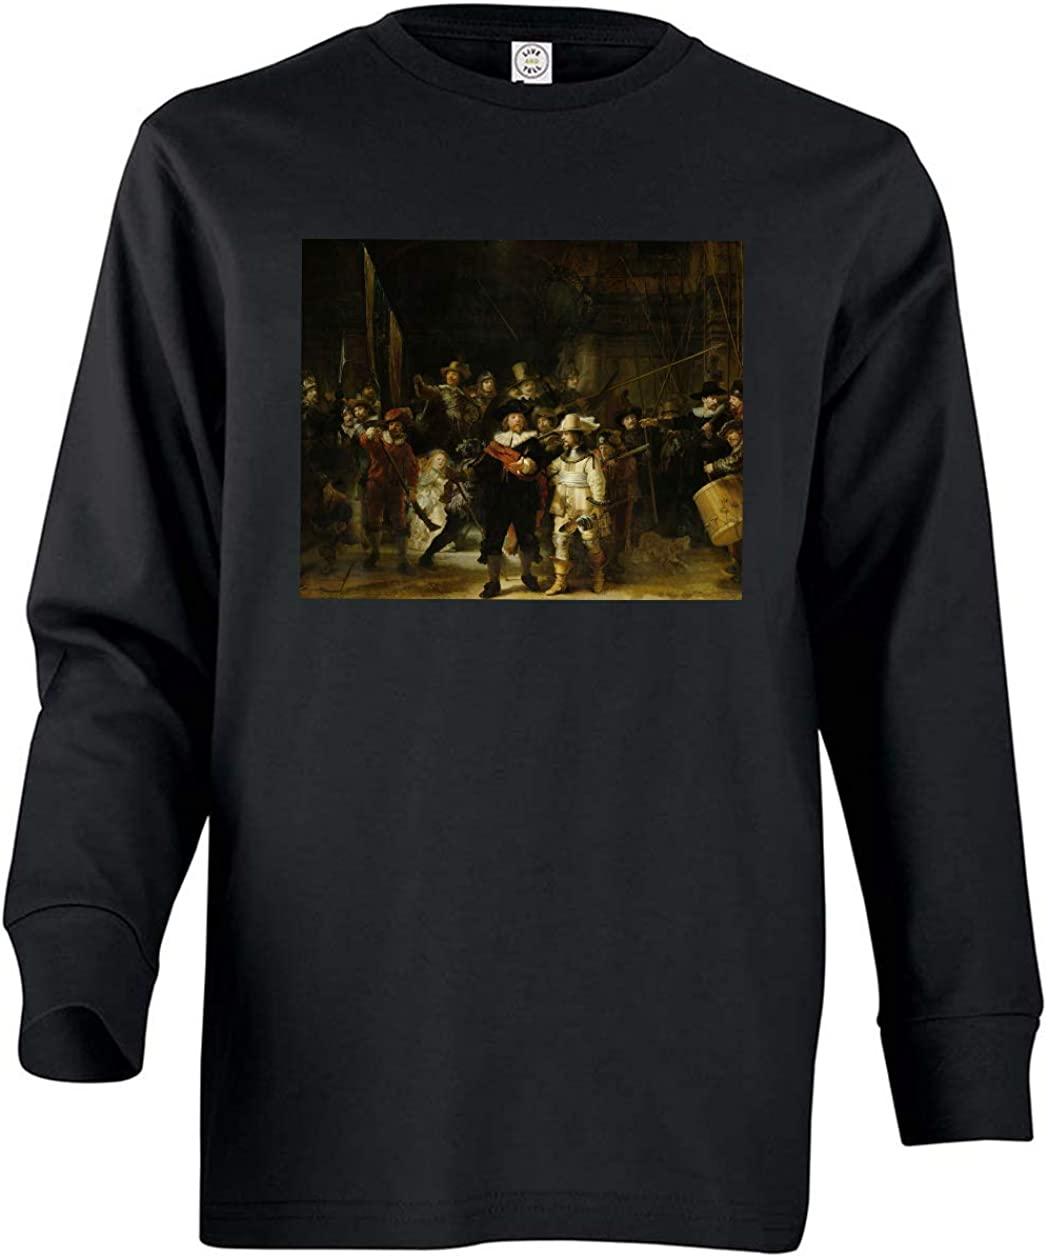 Tenacitee Girl's Youth The Night Watch Long Sleeve T-Shirt